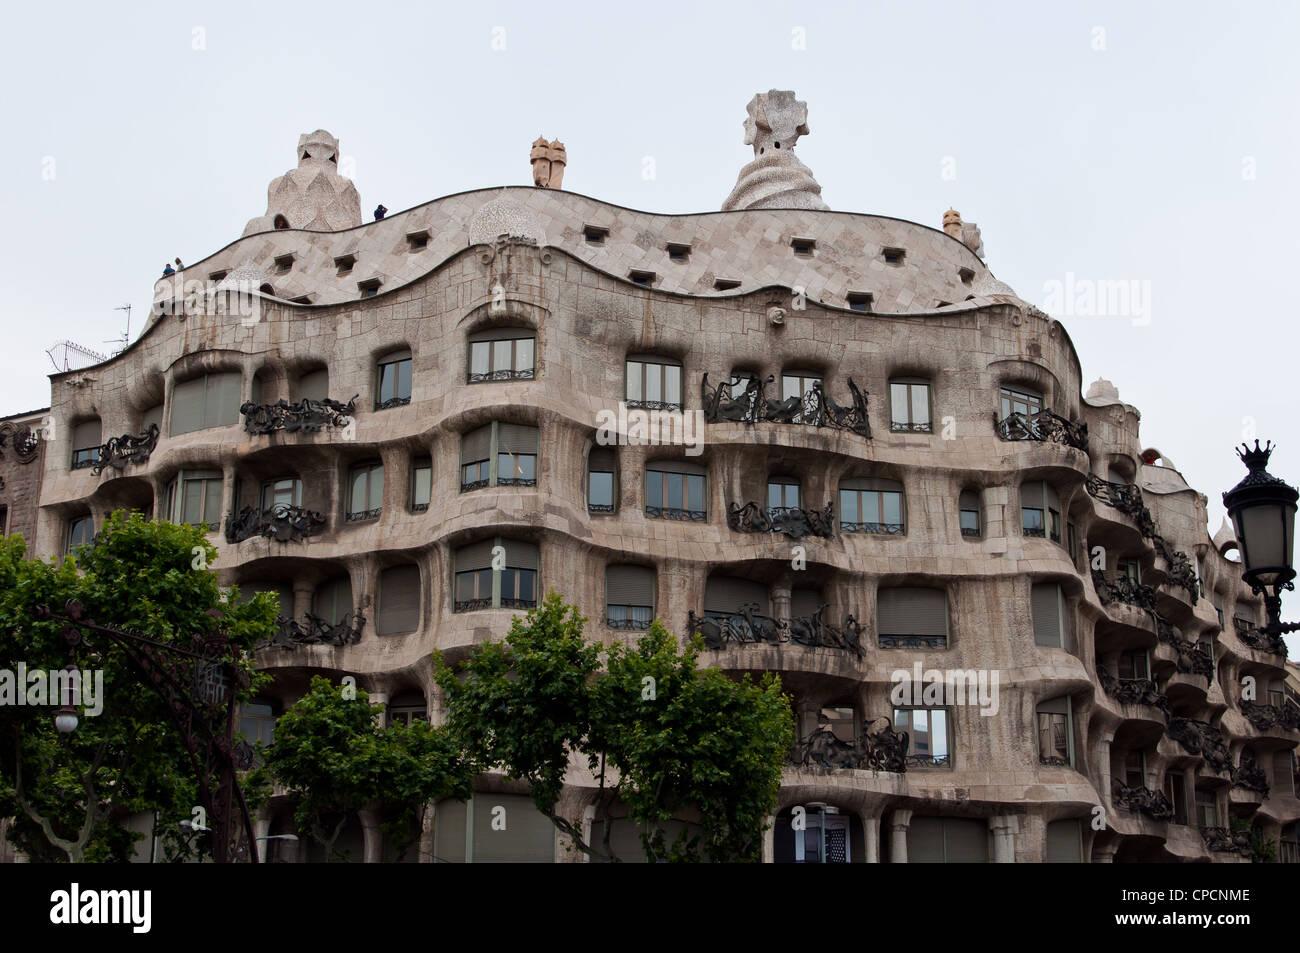 Casa mil la pedrera masterpiece of antoni gaudi barcelona stock photo royalty free image - Casa la pedrera gaudi ...